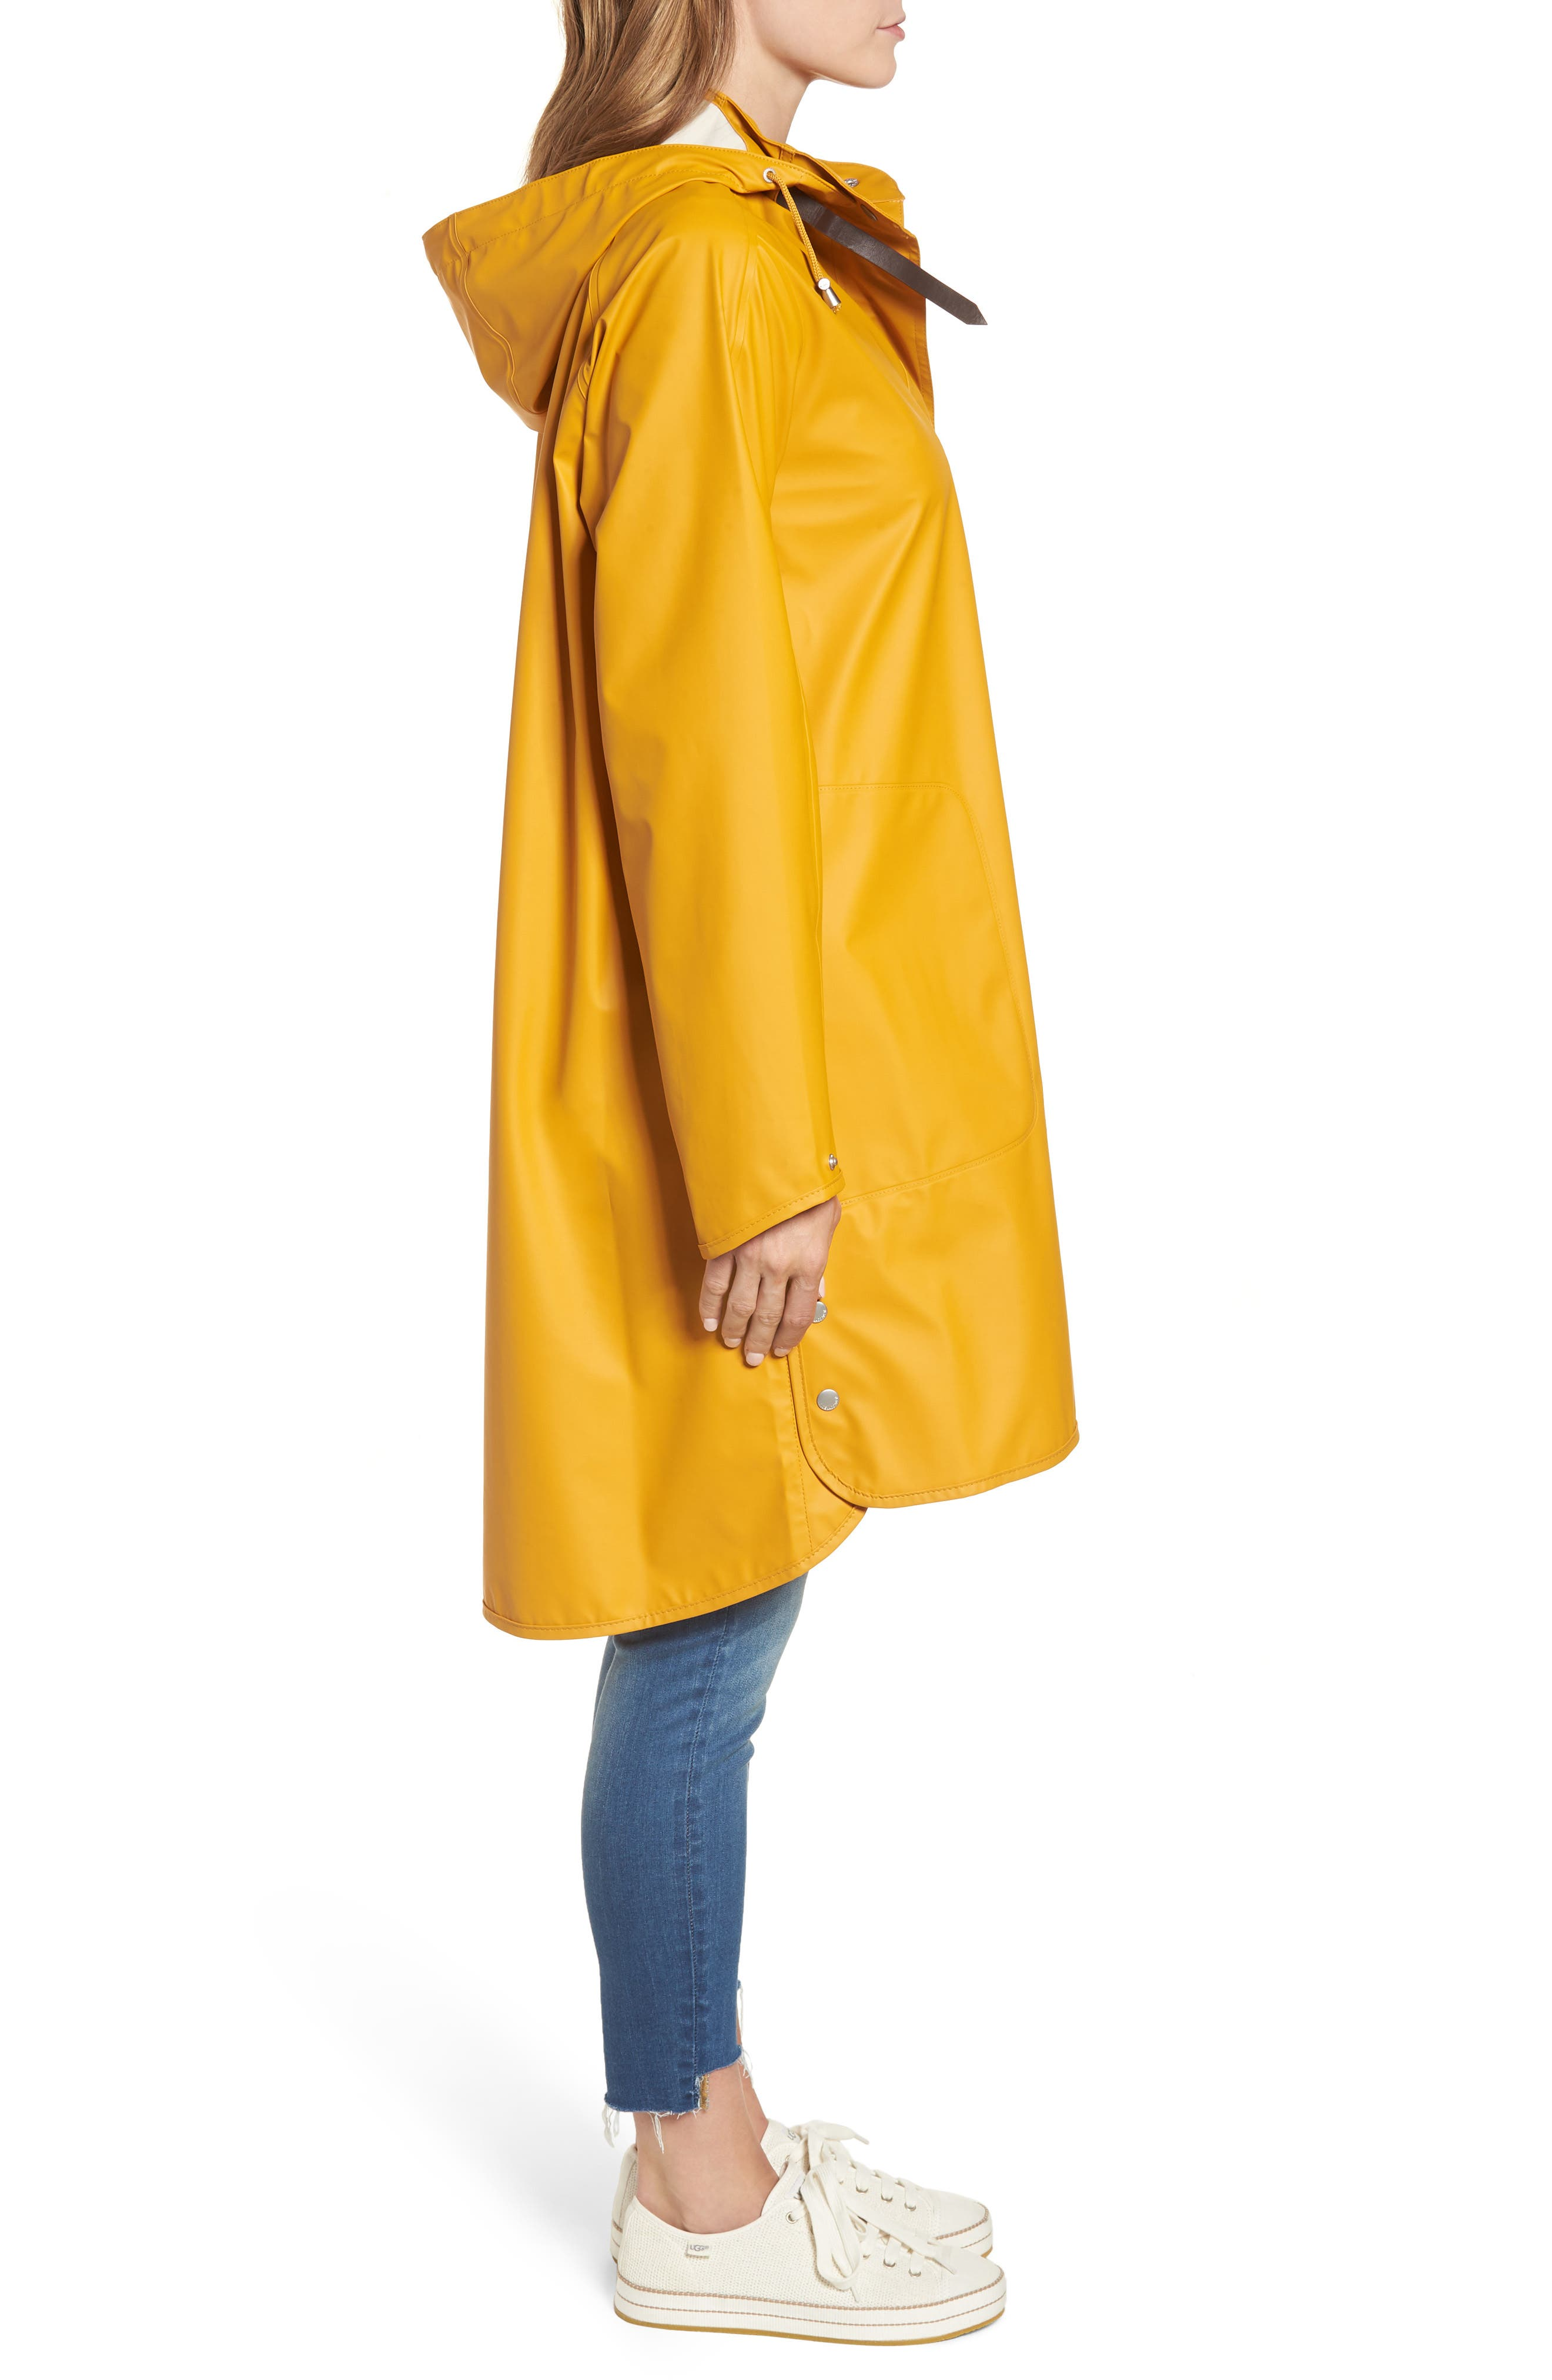 Rain Slicker,                             Alternate thumbnail 3, color,                             Golden Yellow